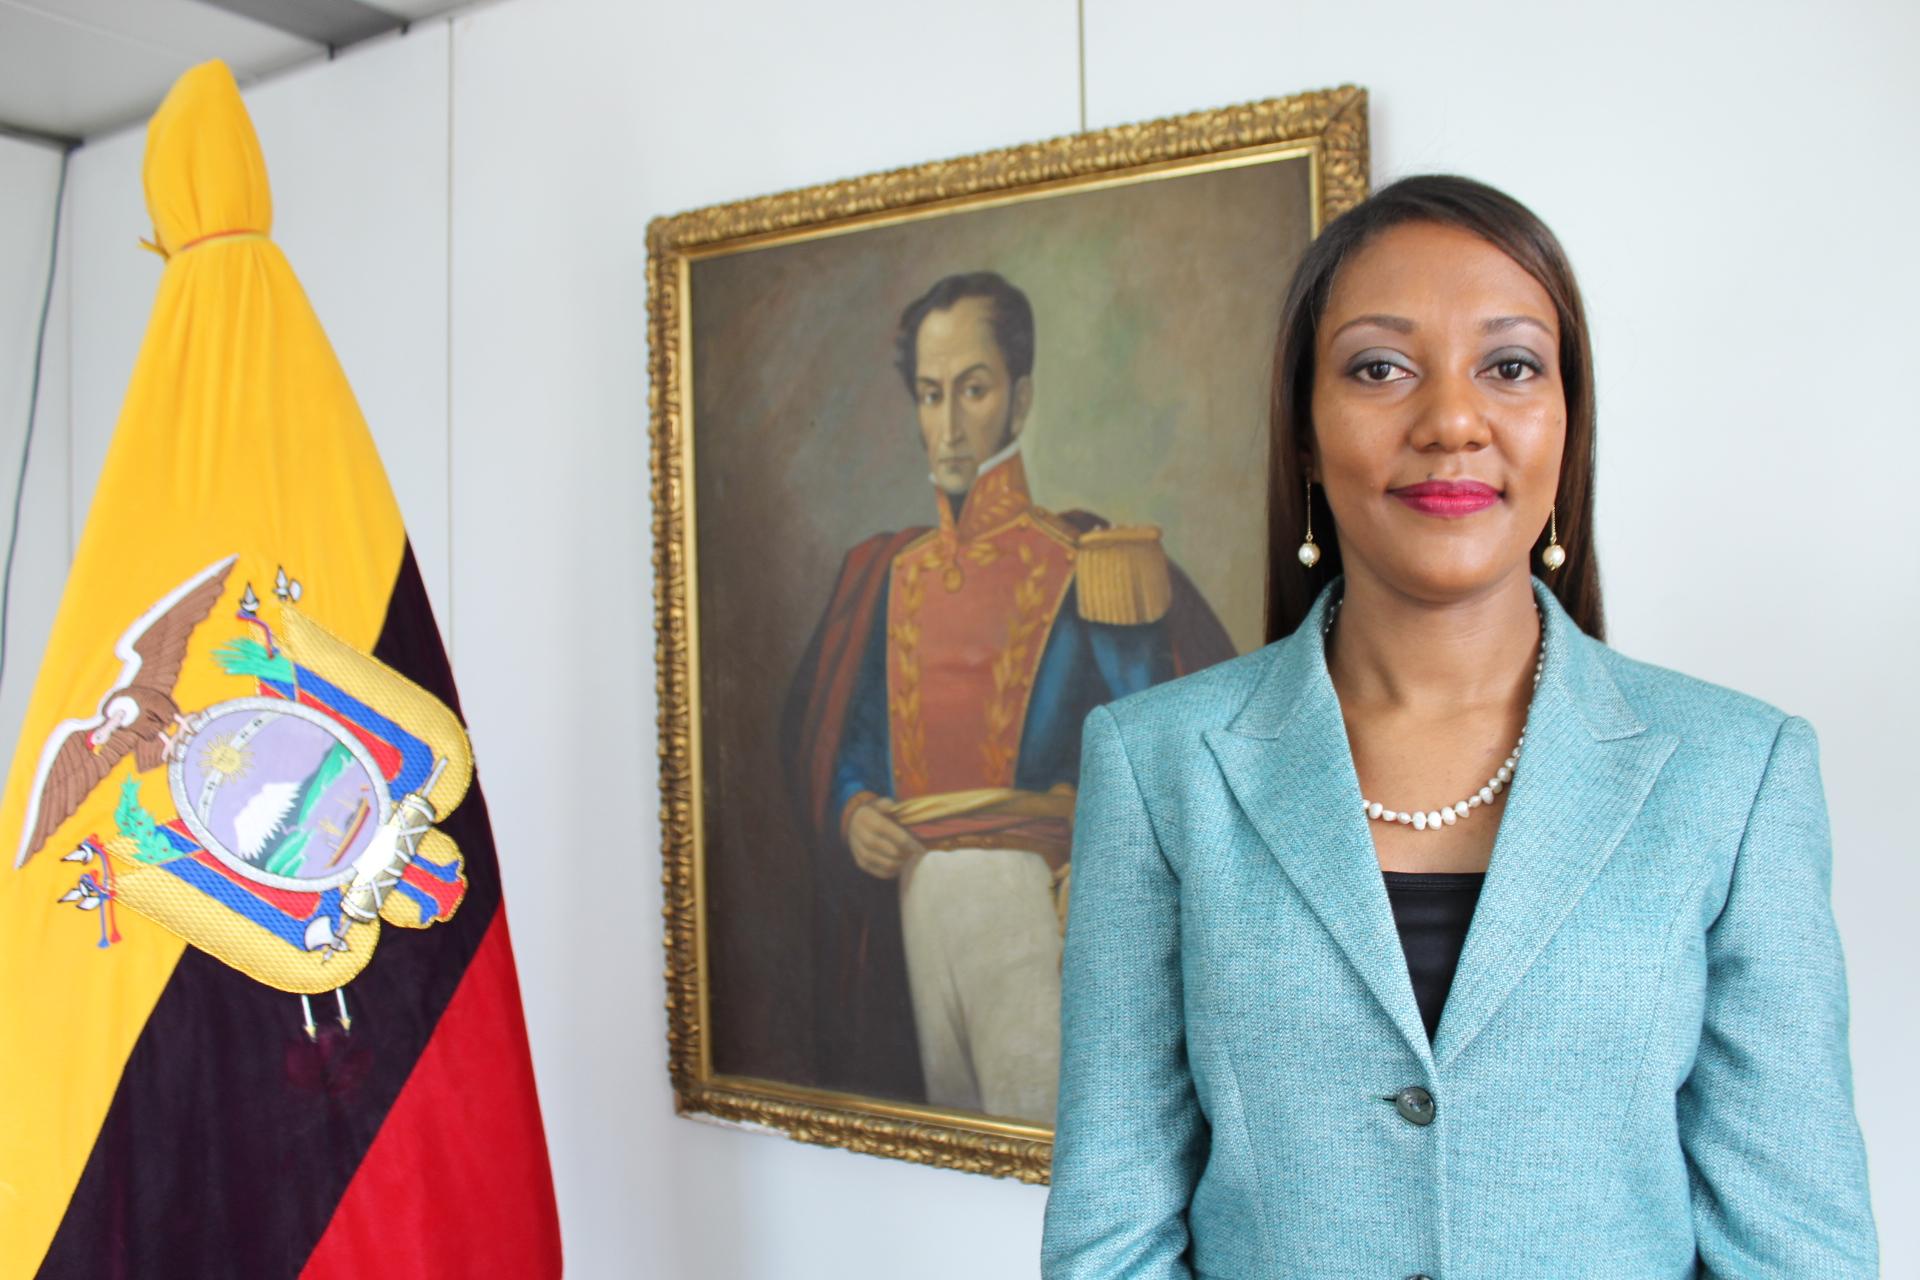 Venezuela expulsa encargada de negocios de Ecuador en